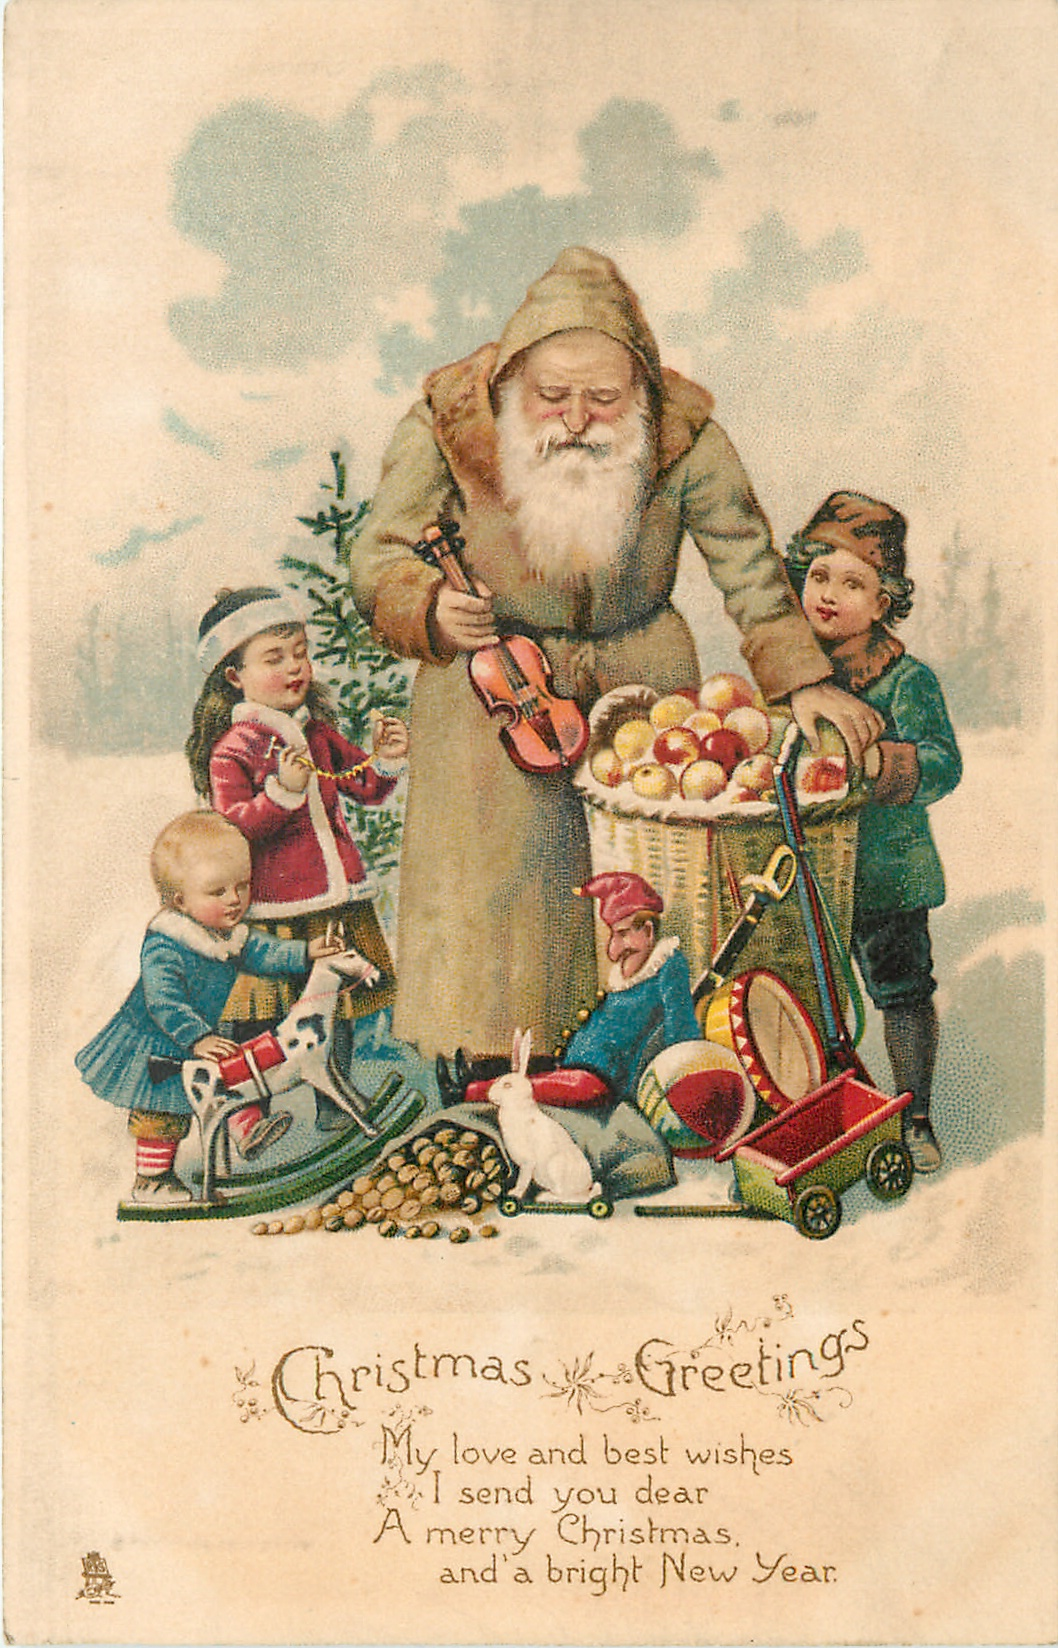 CHRISTMAS GREETINGS Olive Coated Santa Holding Small